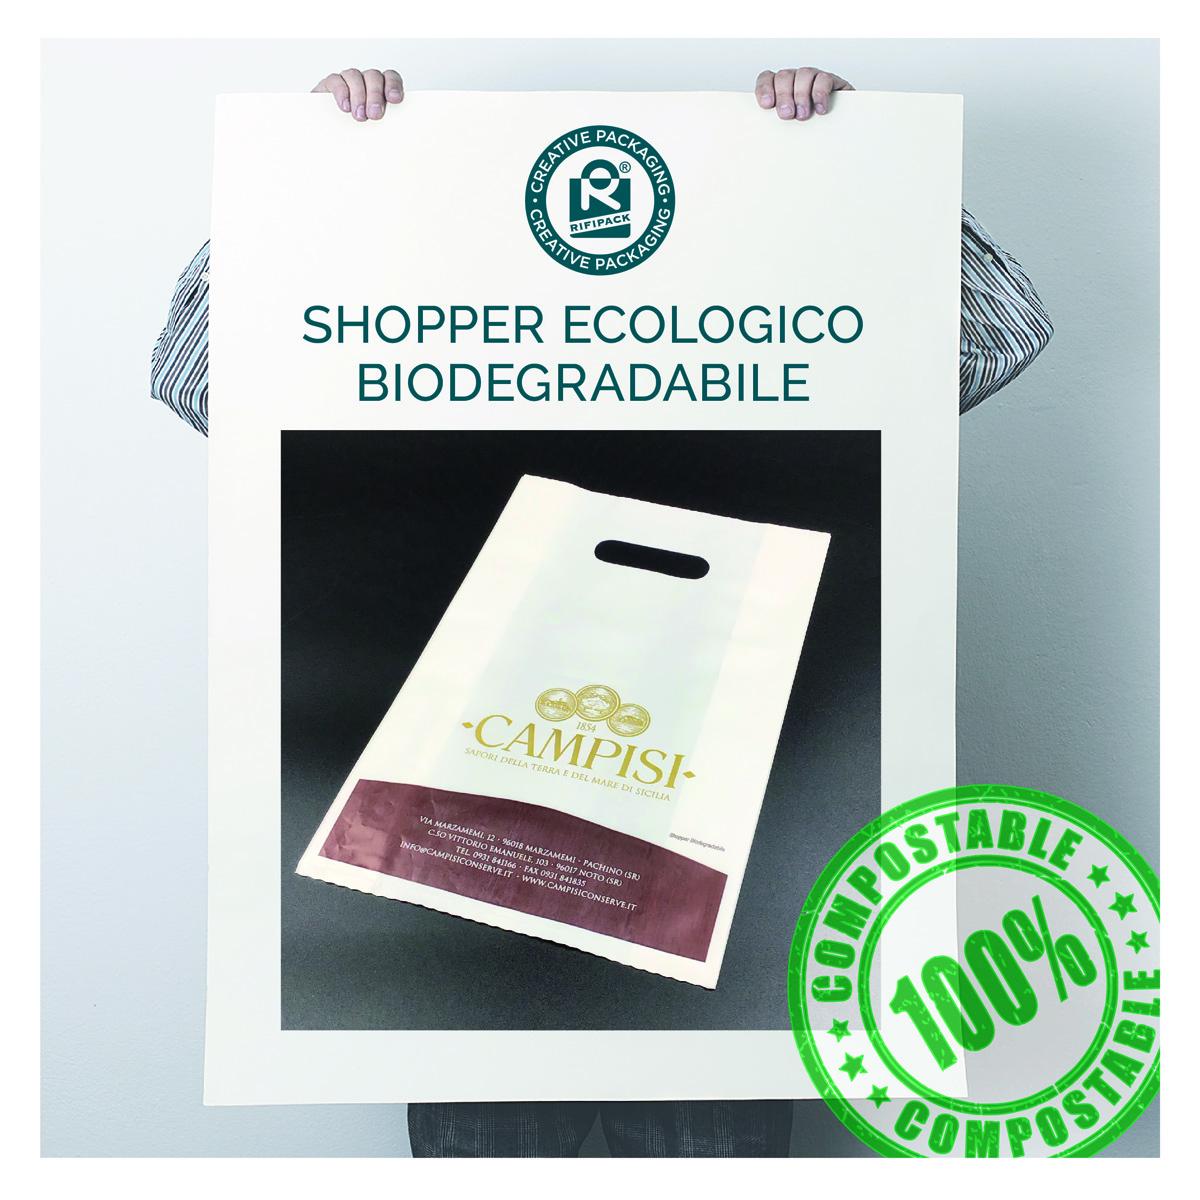 rifipack-shopper-ecologico-biodegradabile-1